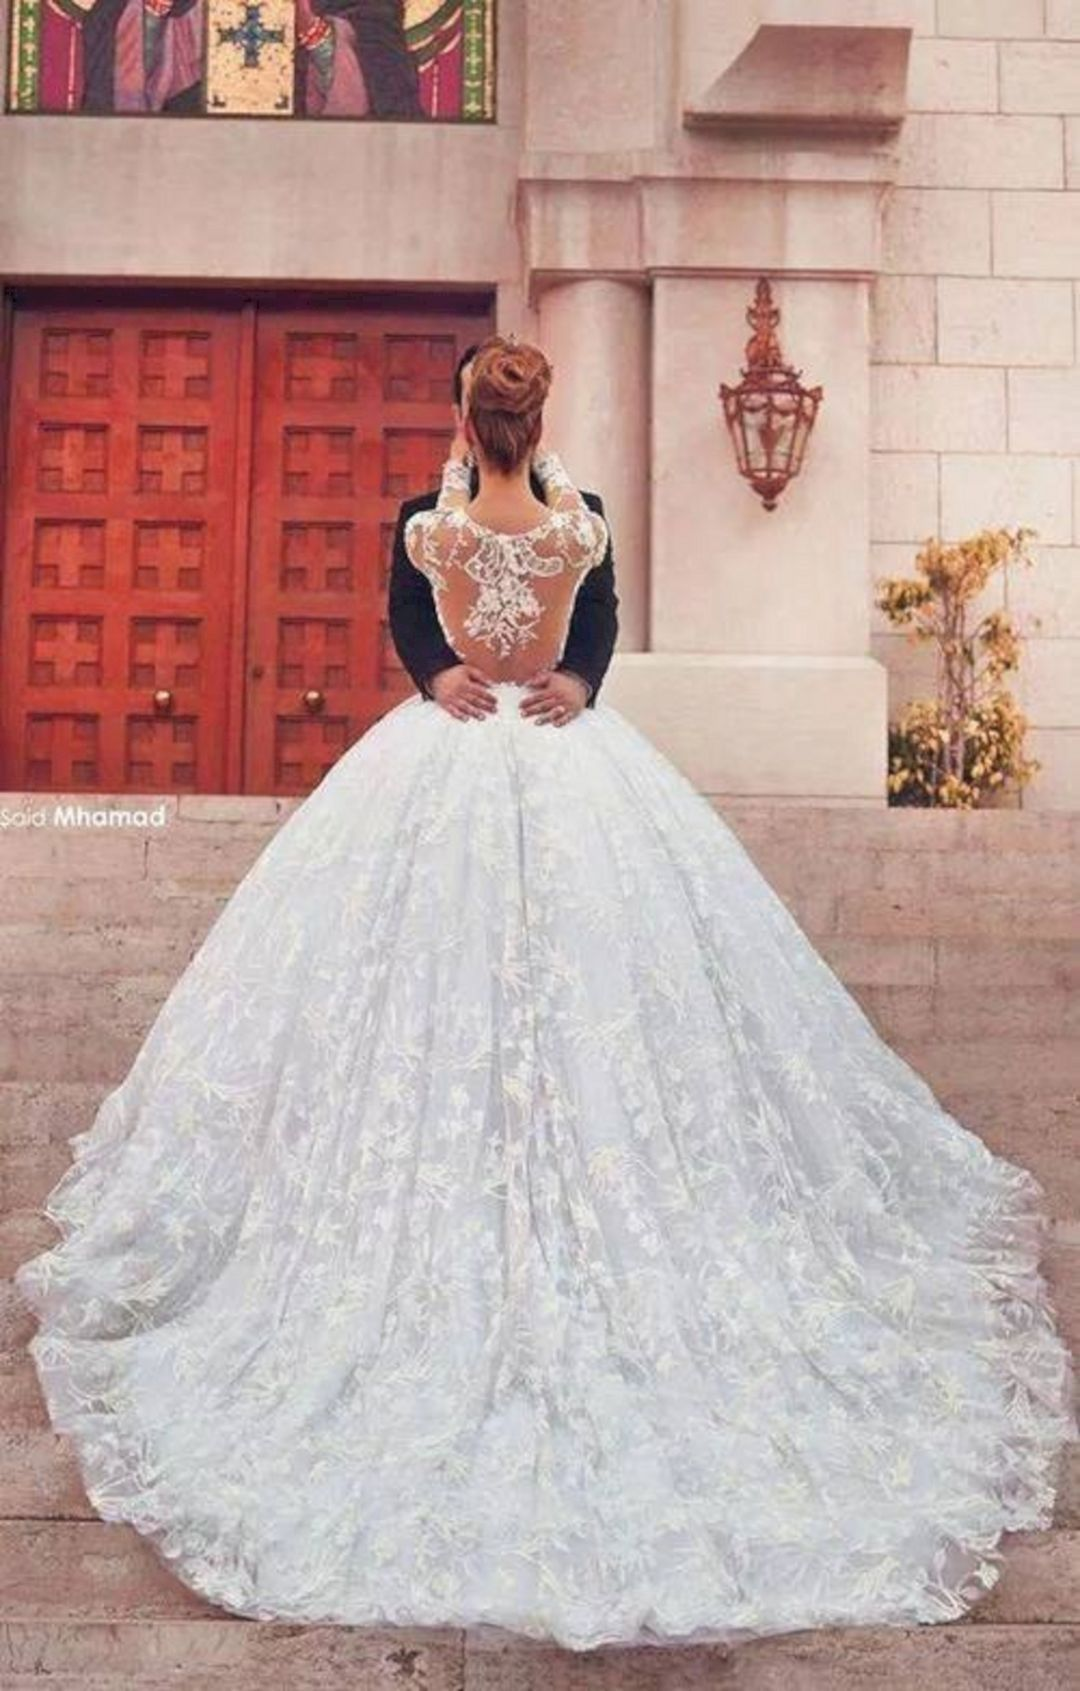 Best princess wedding dresses ideas awesome inspirations